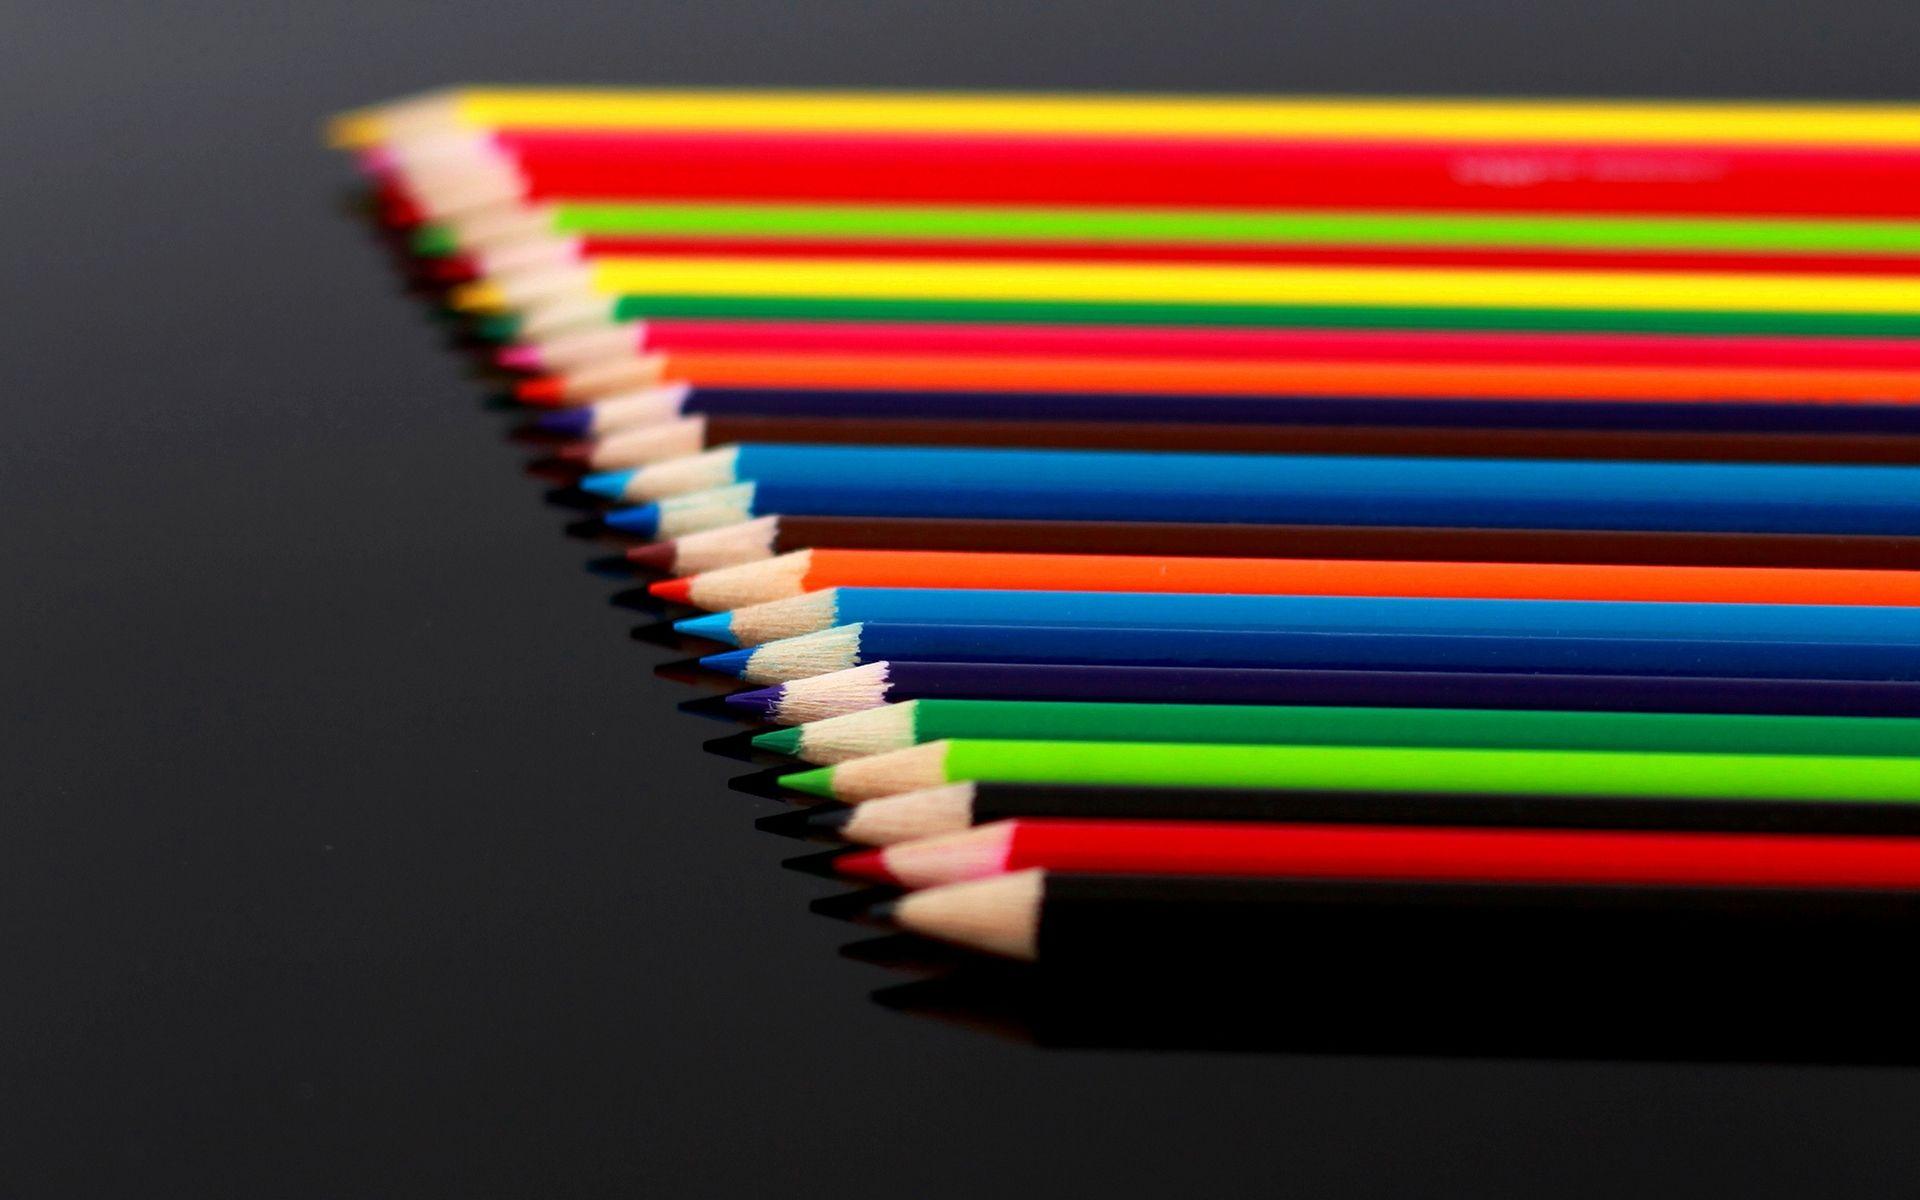 pencil photography hd